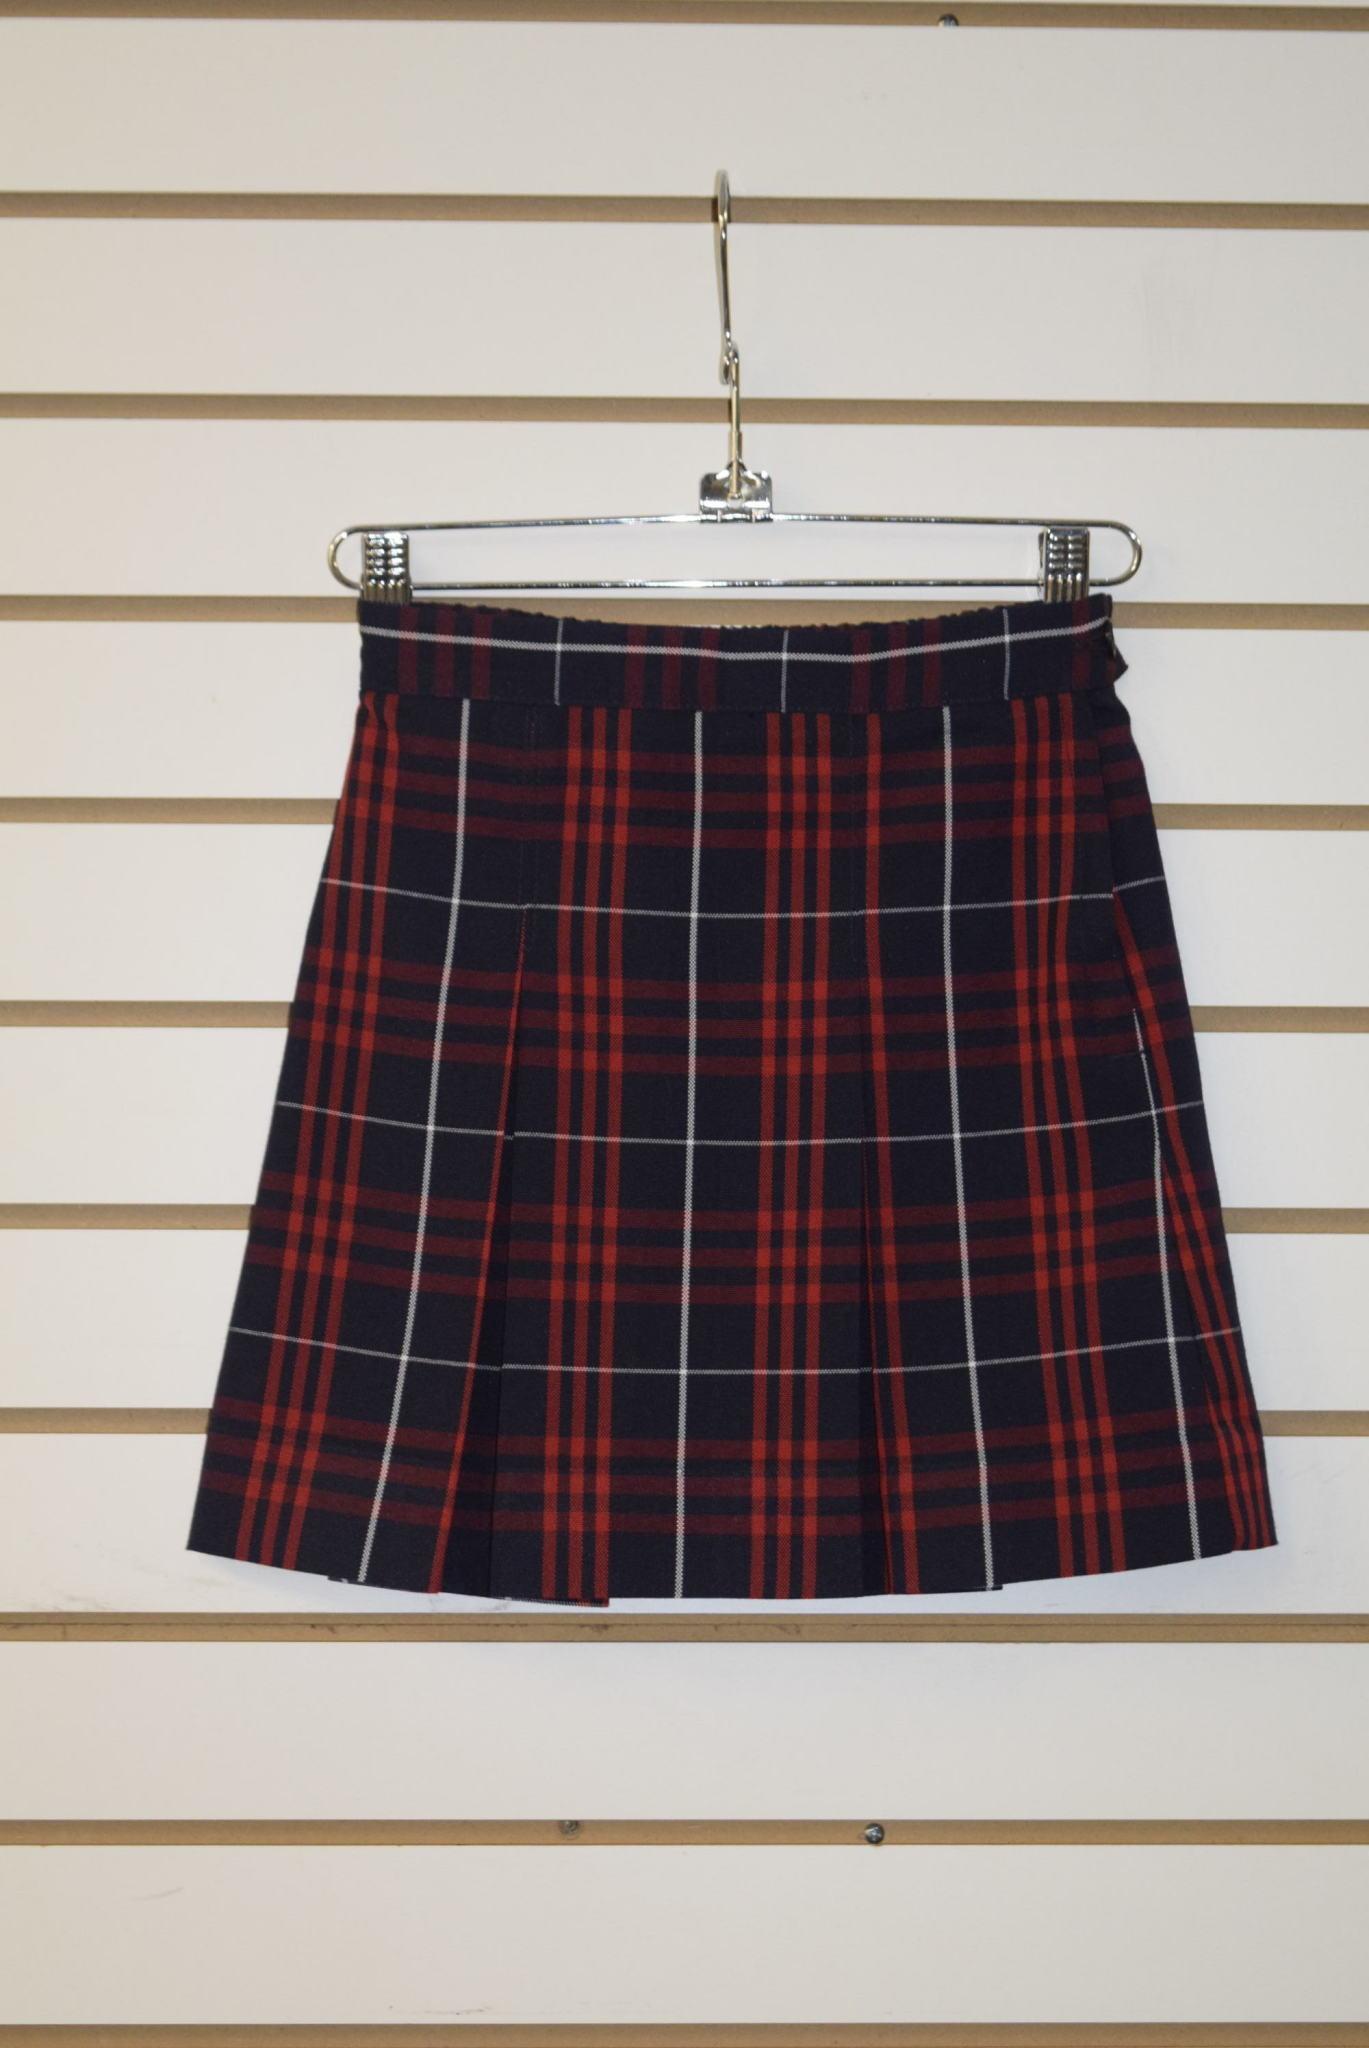 Parker Uniform Skirt 4 Sizes Khaki Tan Multi Box Pleats Polyester Blend NEW